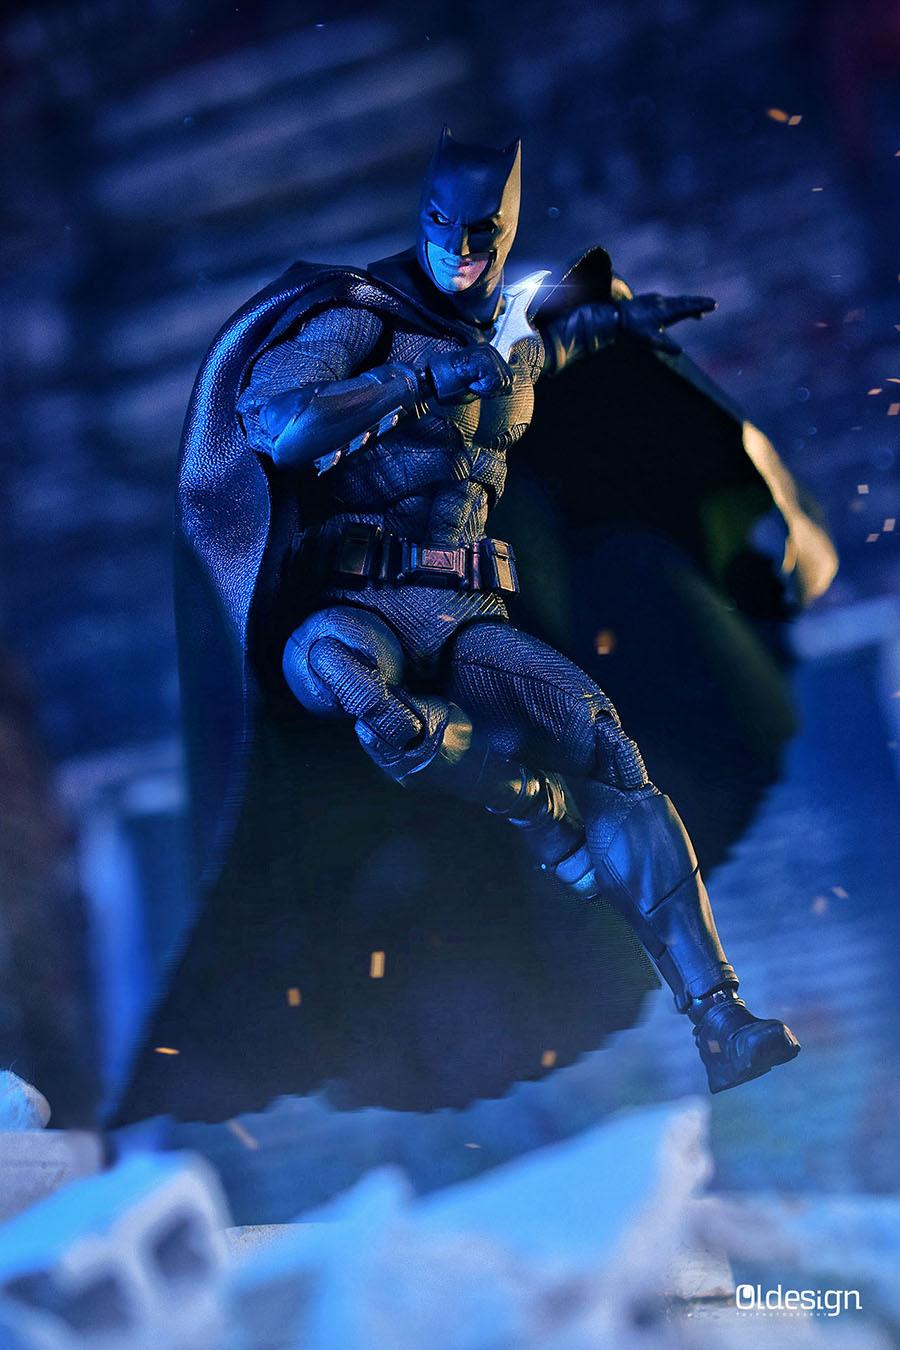 oldesign_batman_02